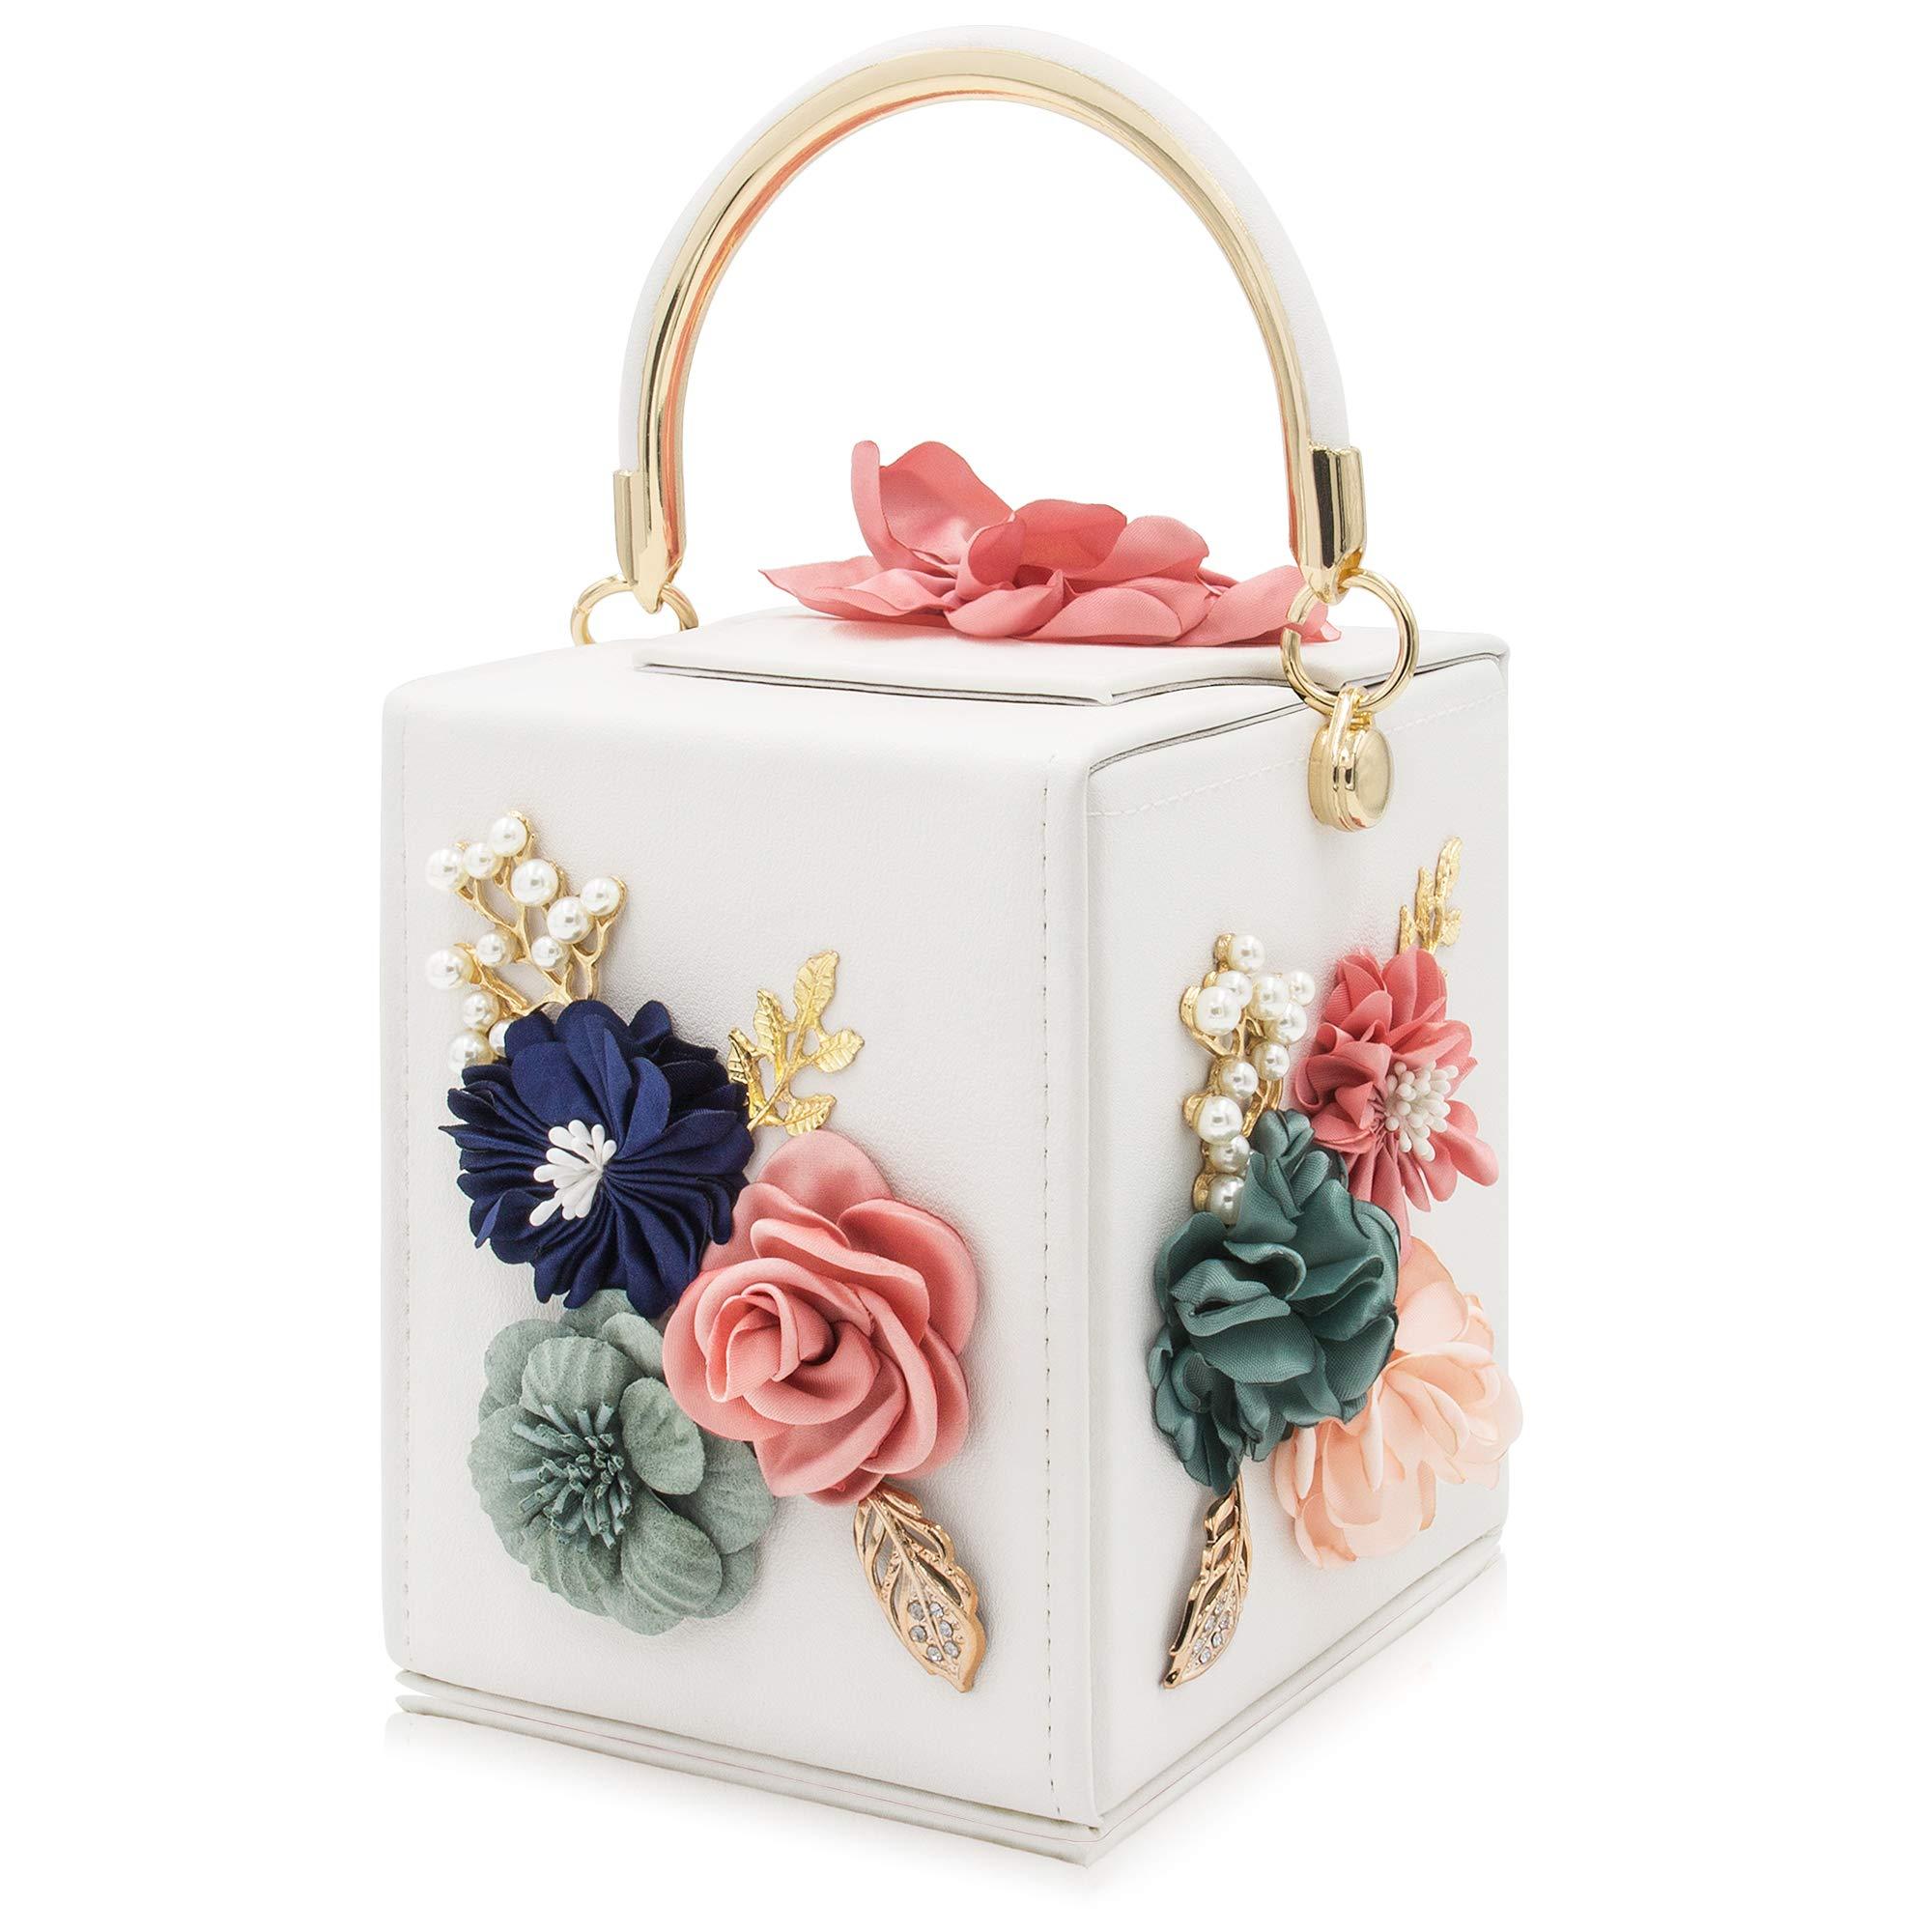 Milisente Women Clutches Flower Clutch Bag Box Clutch Purse Evening Handbag (White)